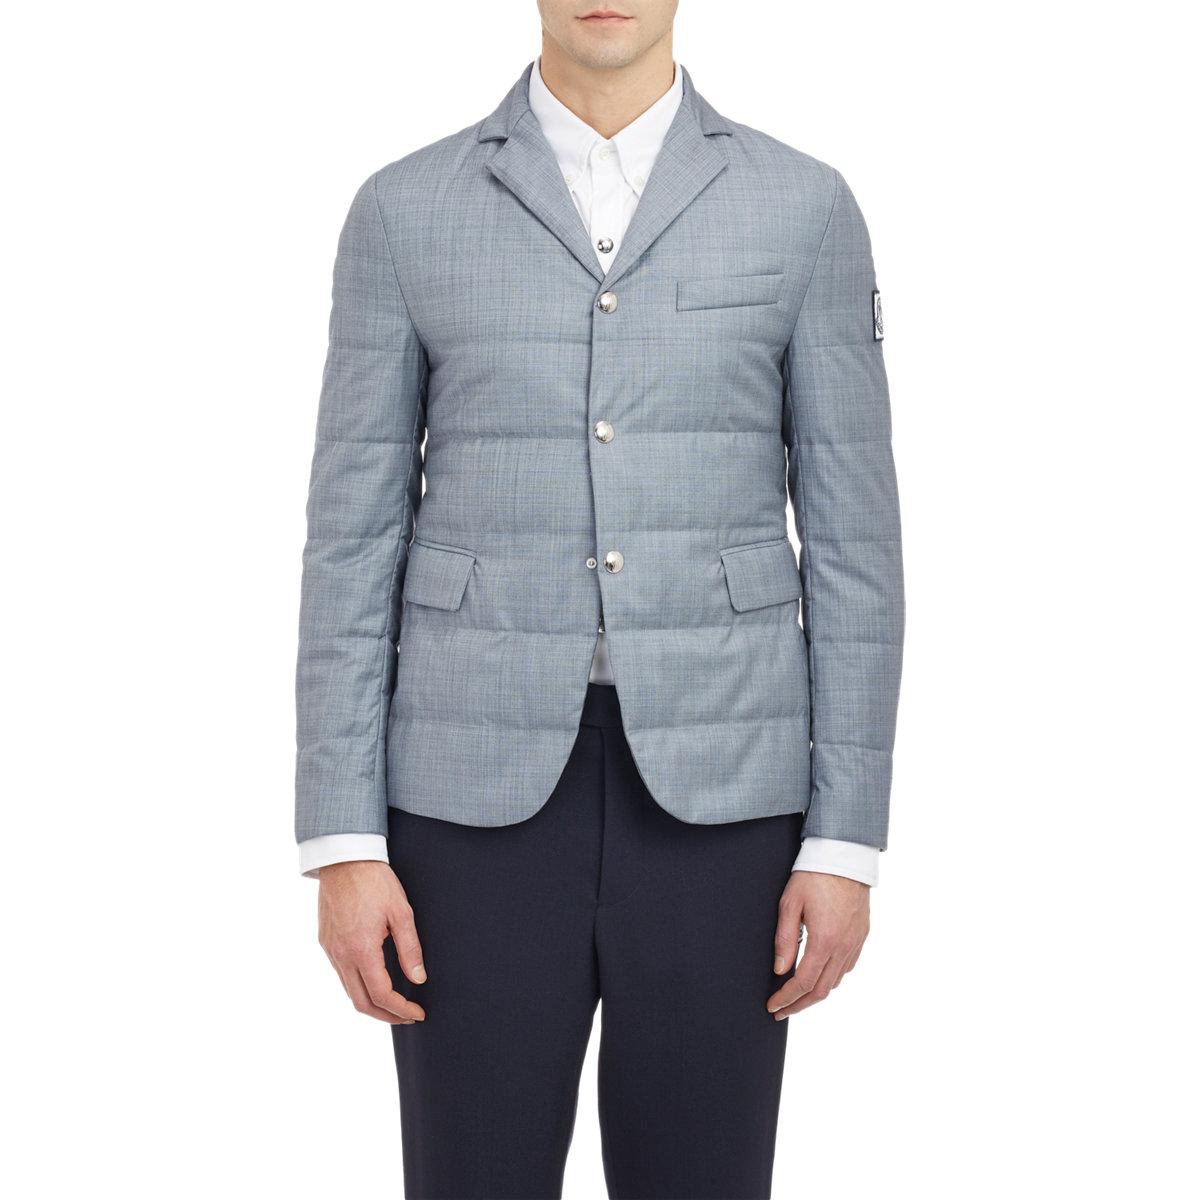 Moncler Gamme Bleu Quilted Classic Blazer- Grey jacket